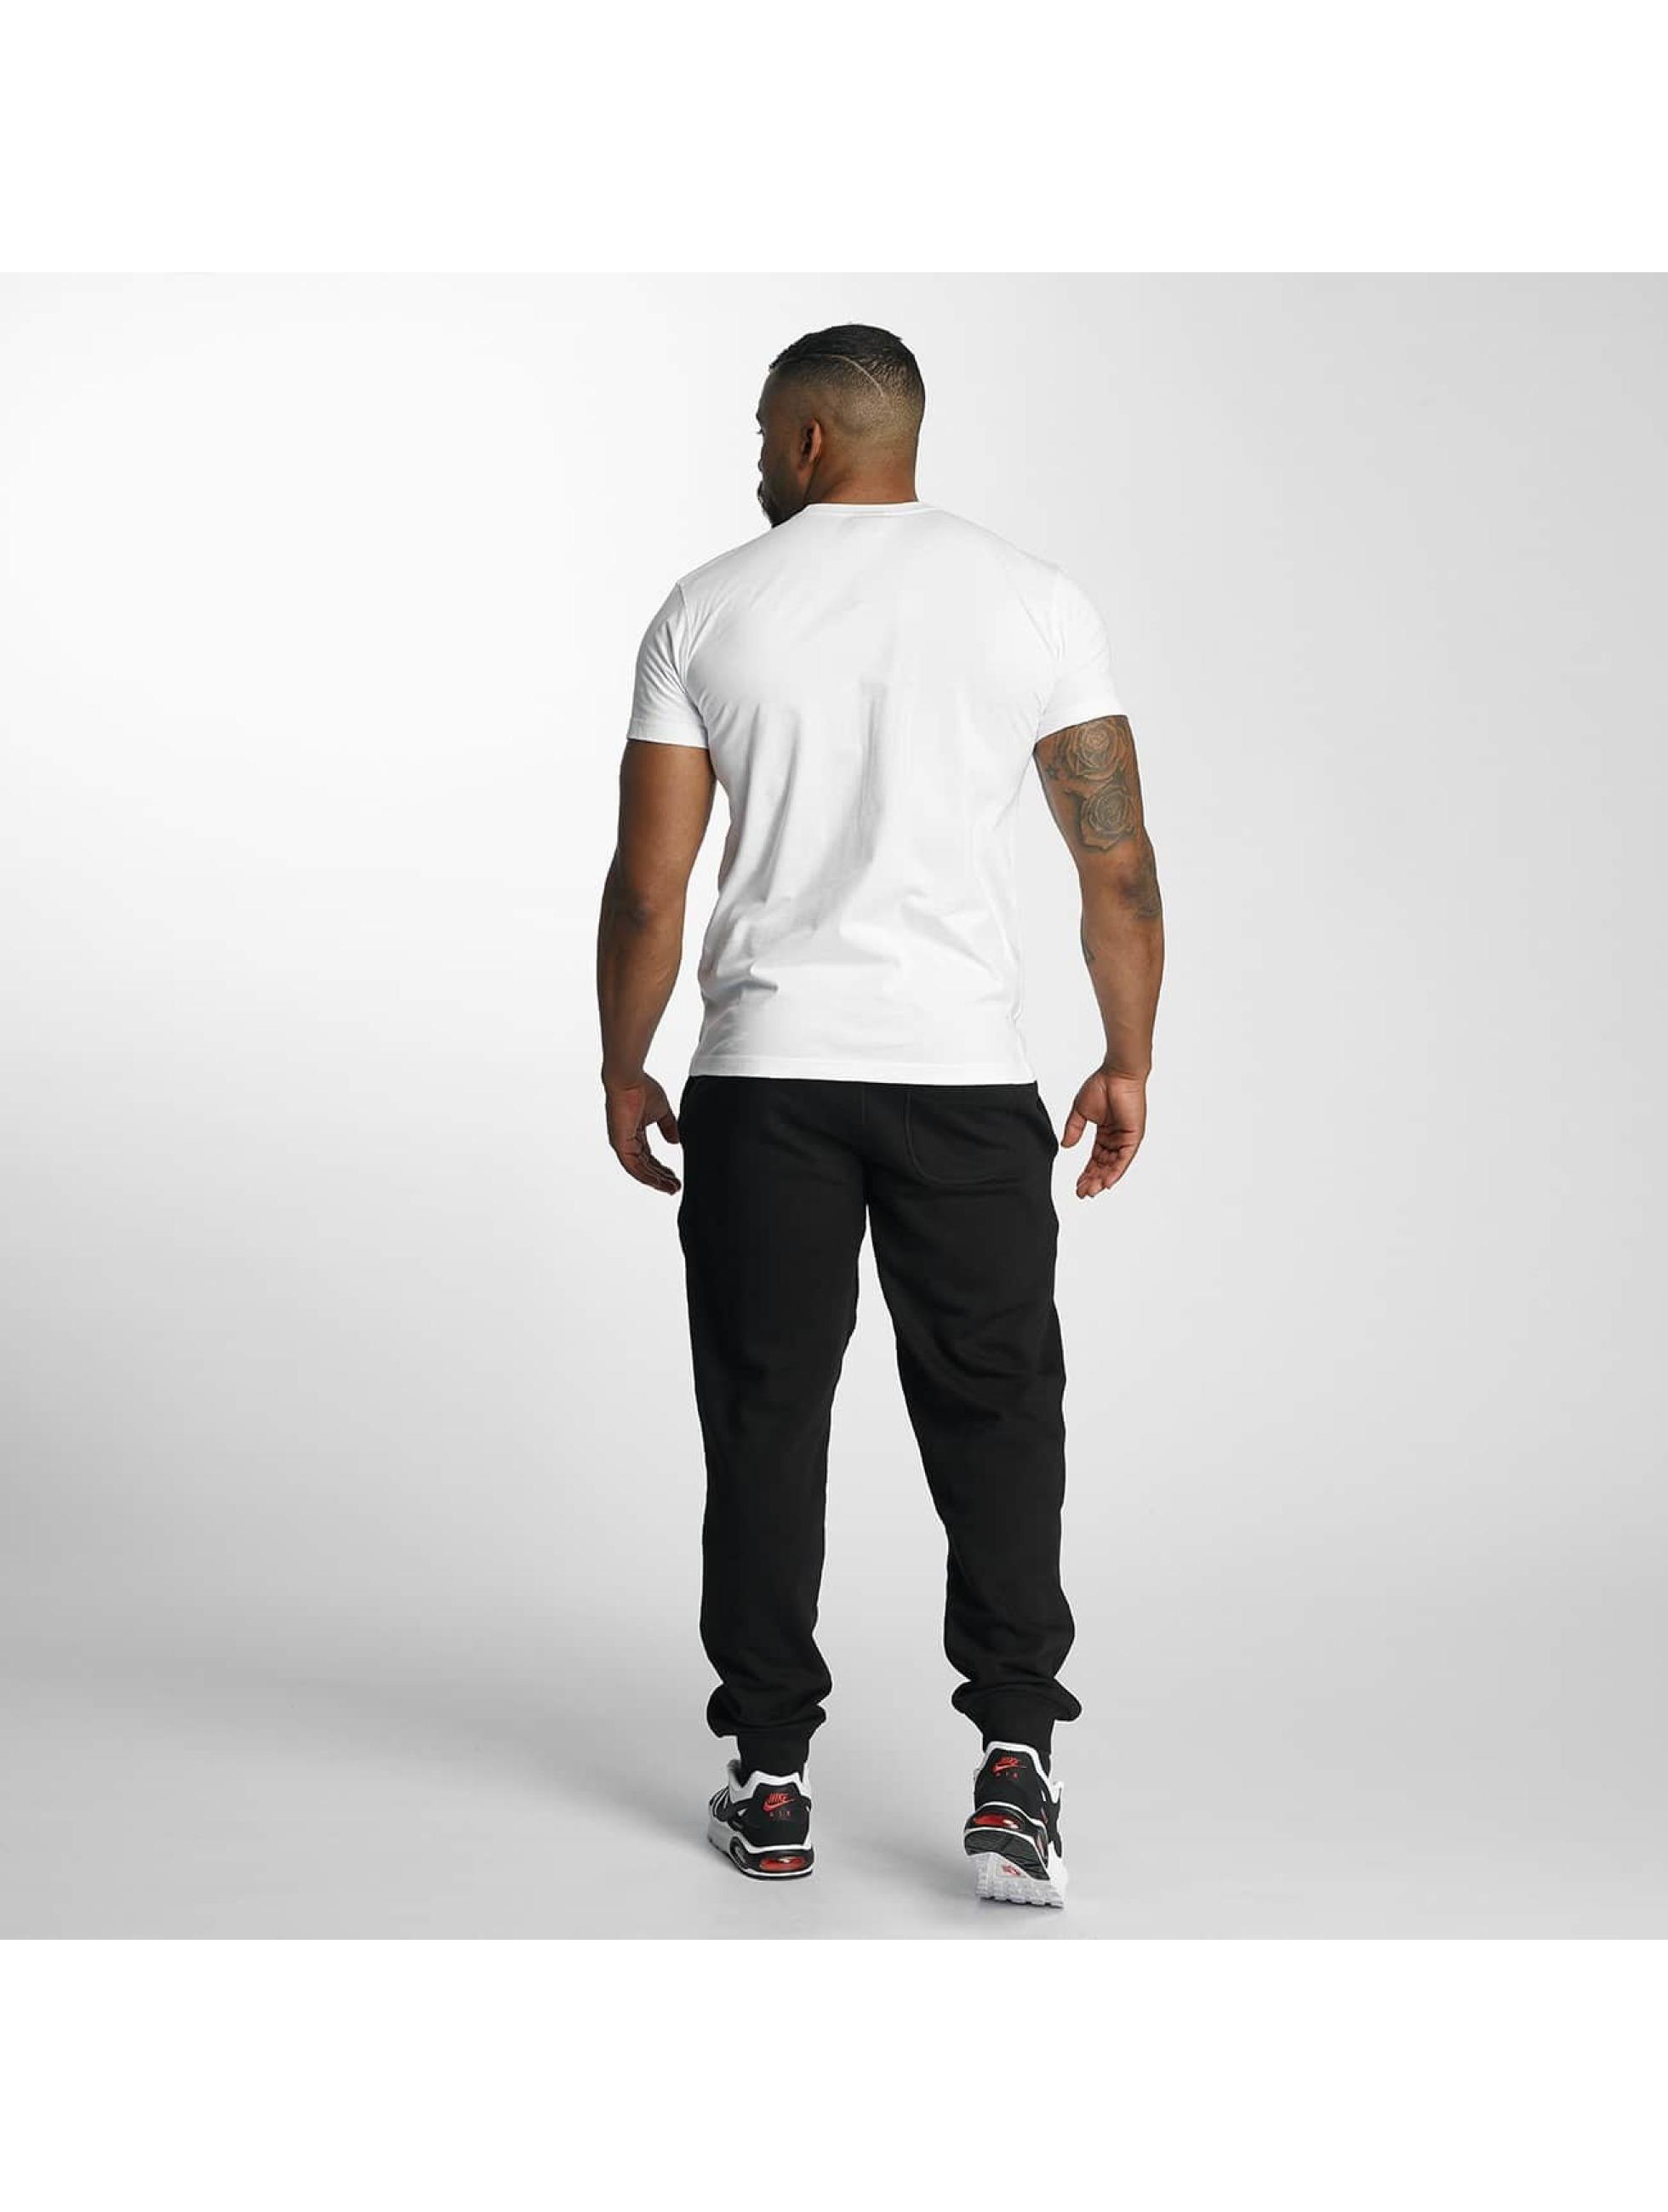 Pusher Apparel T-Shirt White Carrera blanc